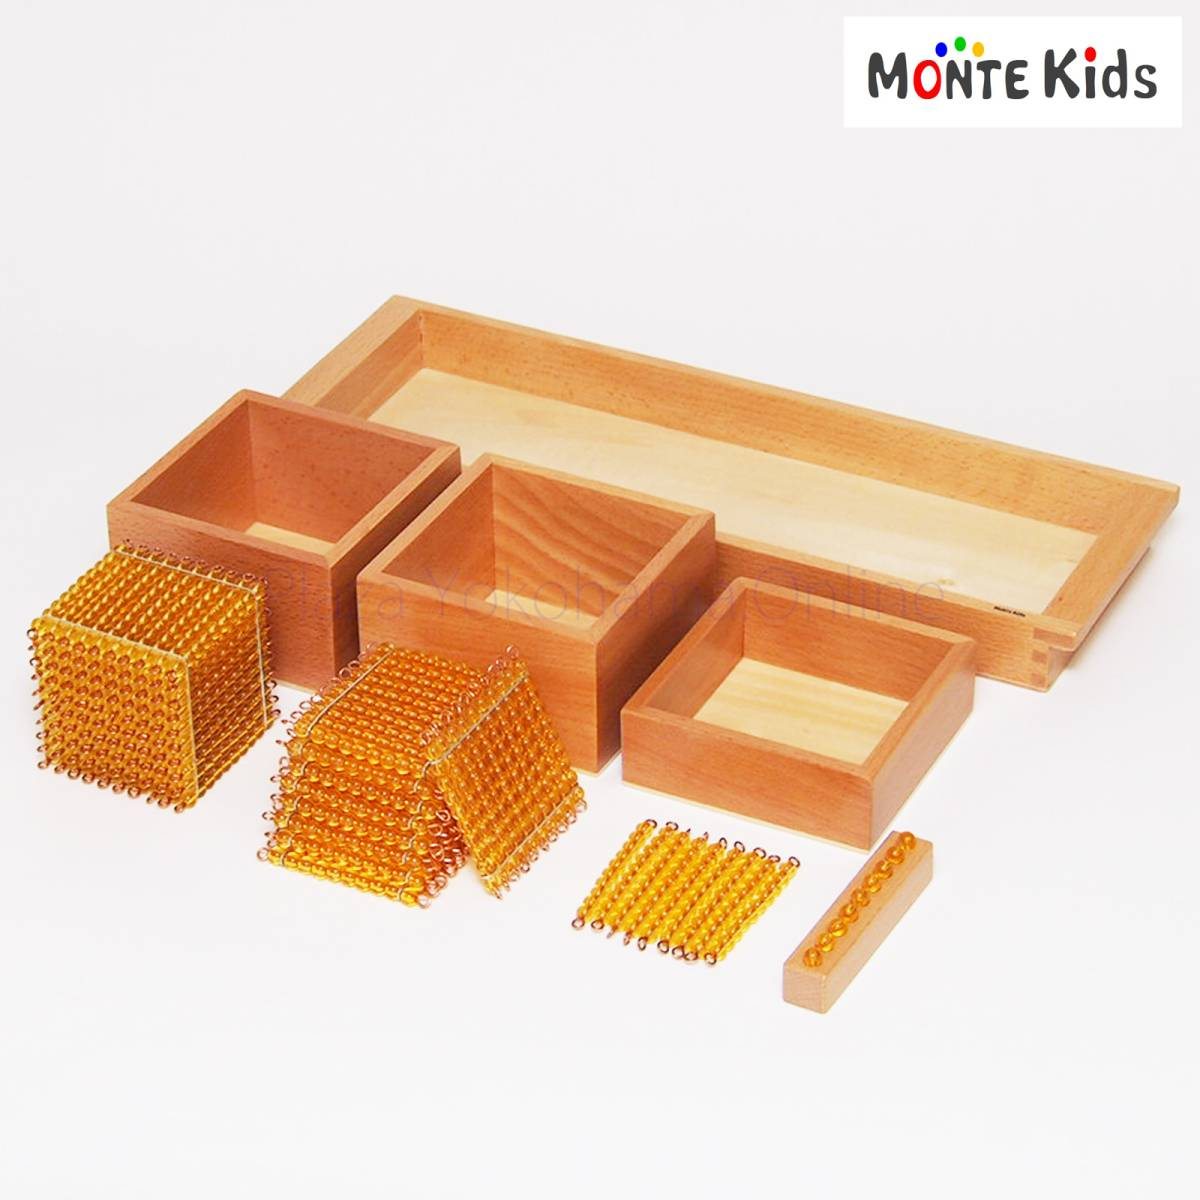 【outlet】☆モンテッソーリ教具☆- 十進法 1-1000の金ビーズ-【MONTE Kids正規品】 純正規格 Montessori 知育玩具教具 早期教育教材_画像2